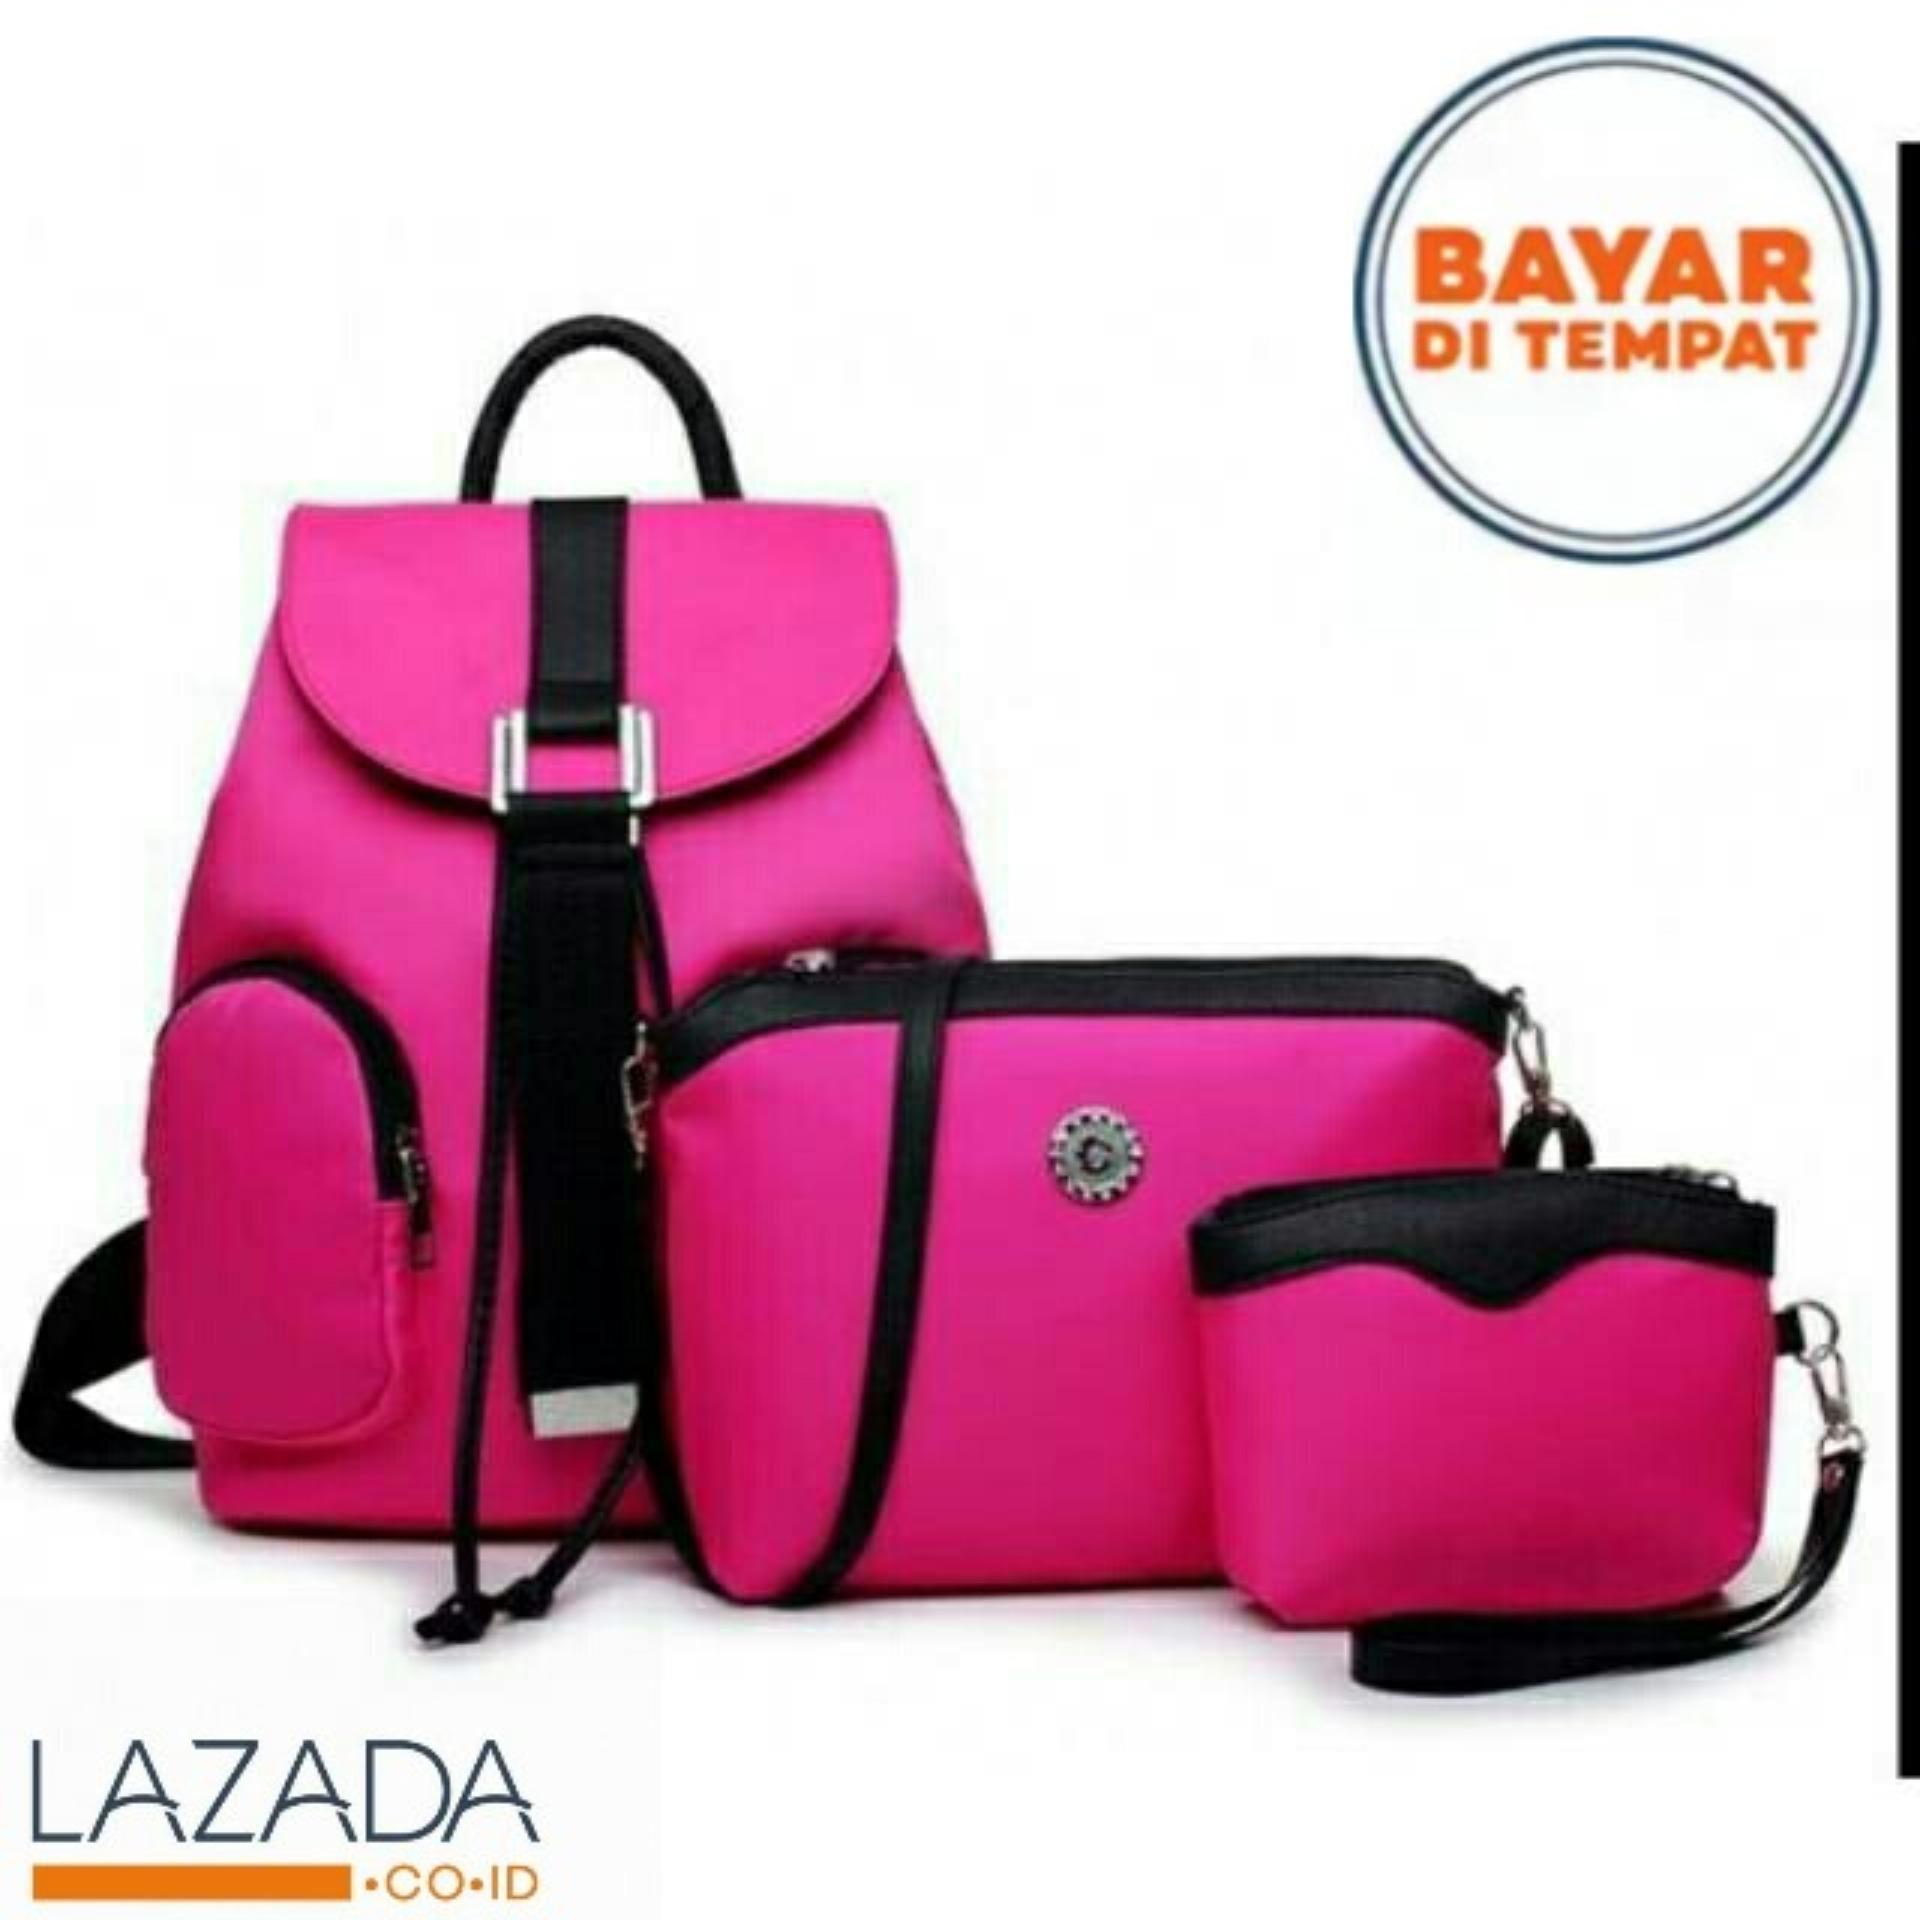 Backpack Set Korean Style 3 In 1 Double Clasp Tas Ransel Selempang Cross Body Bag Kulit  Pulcher Zayn Black Import Batam Wanita Fashion Free Dompet Yosh